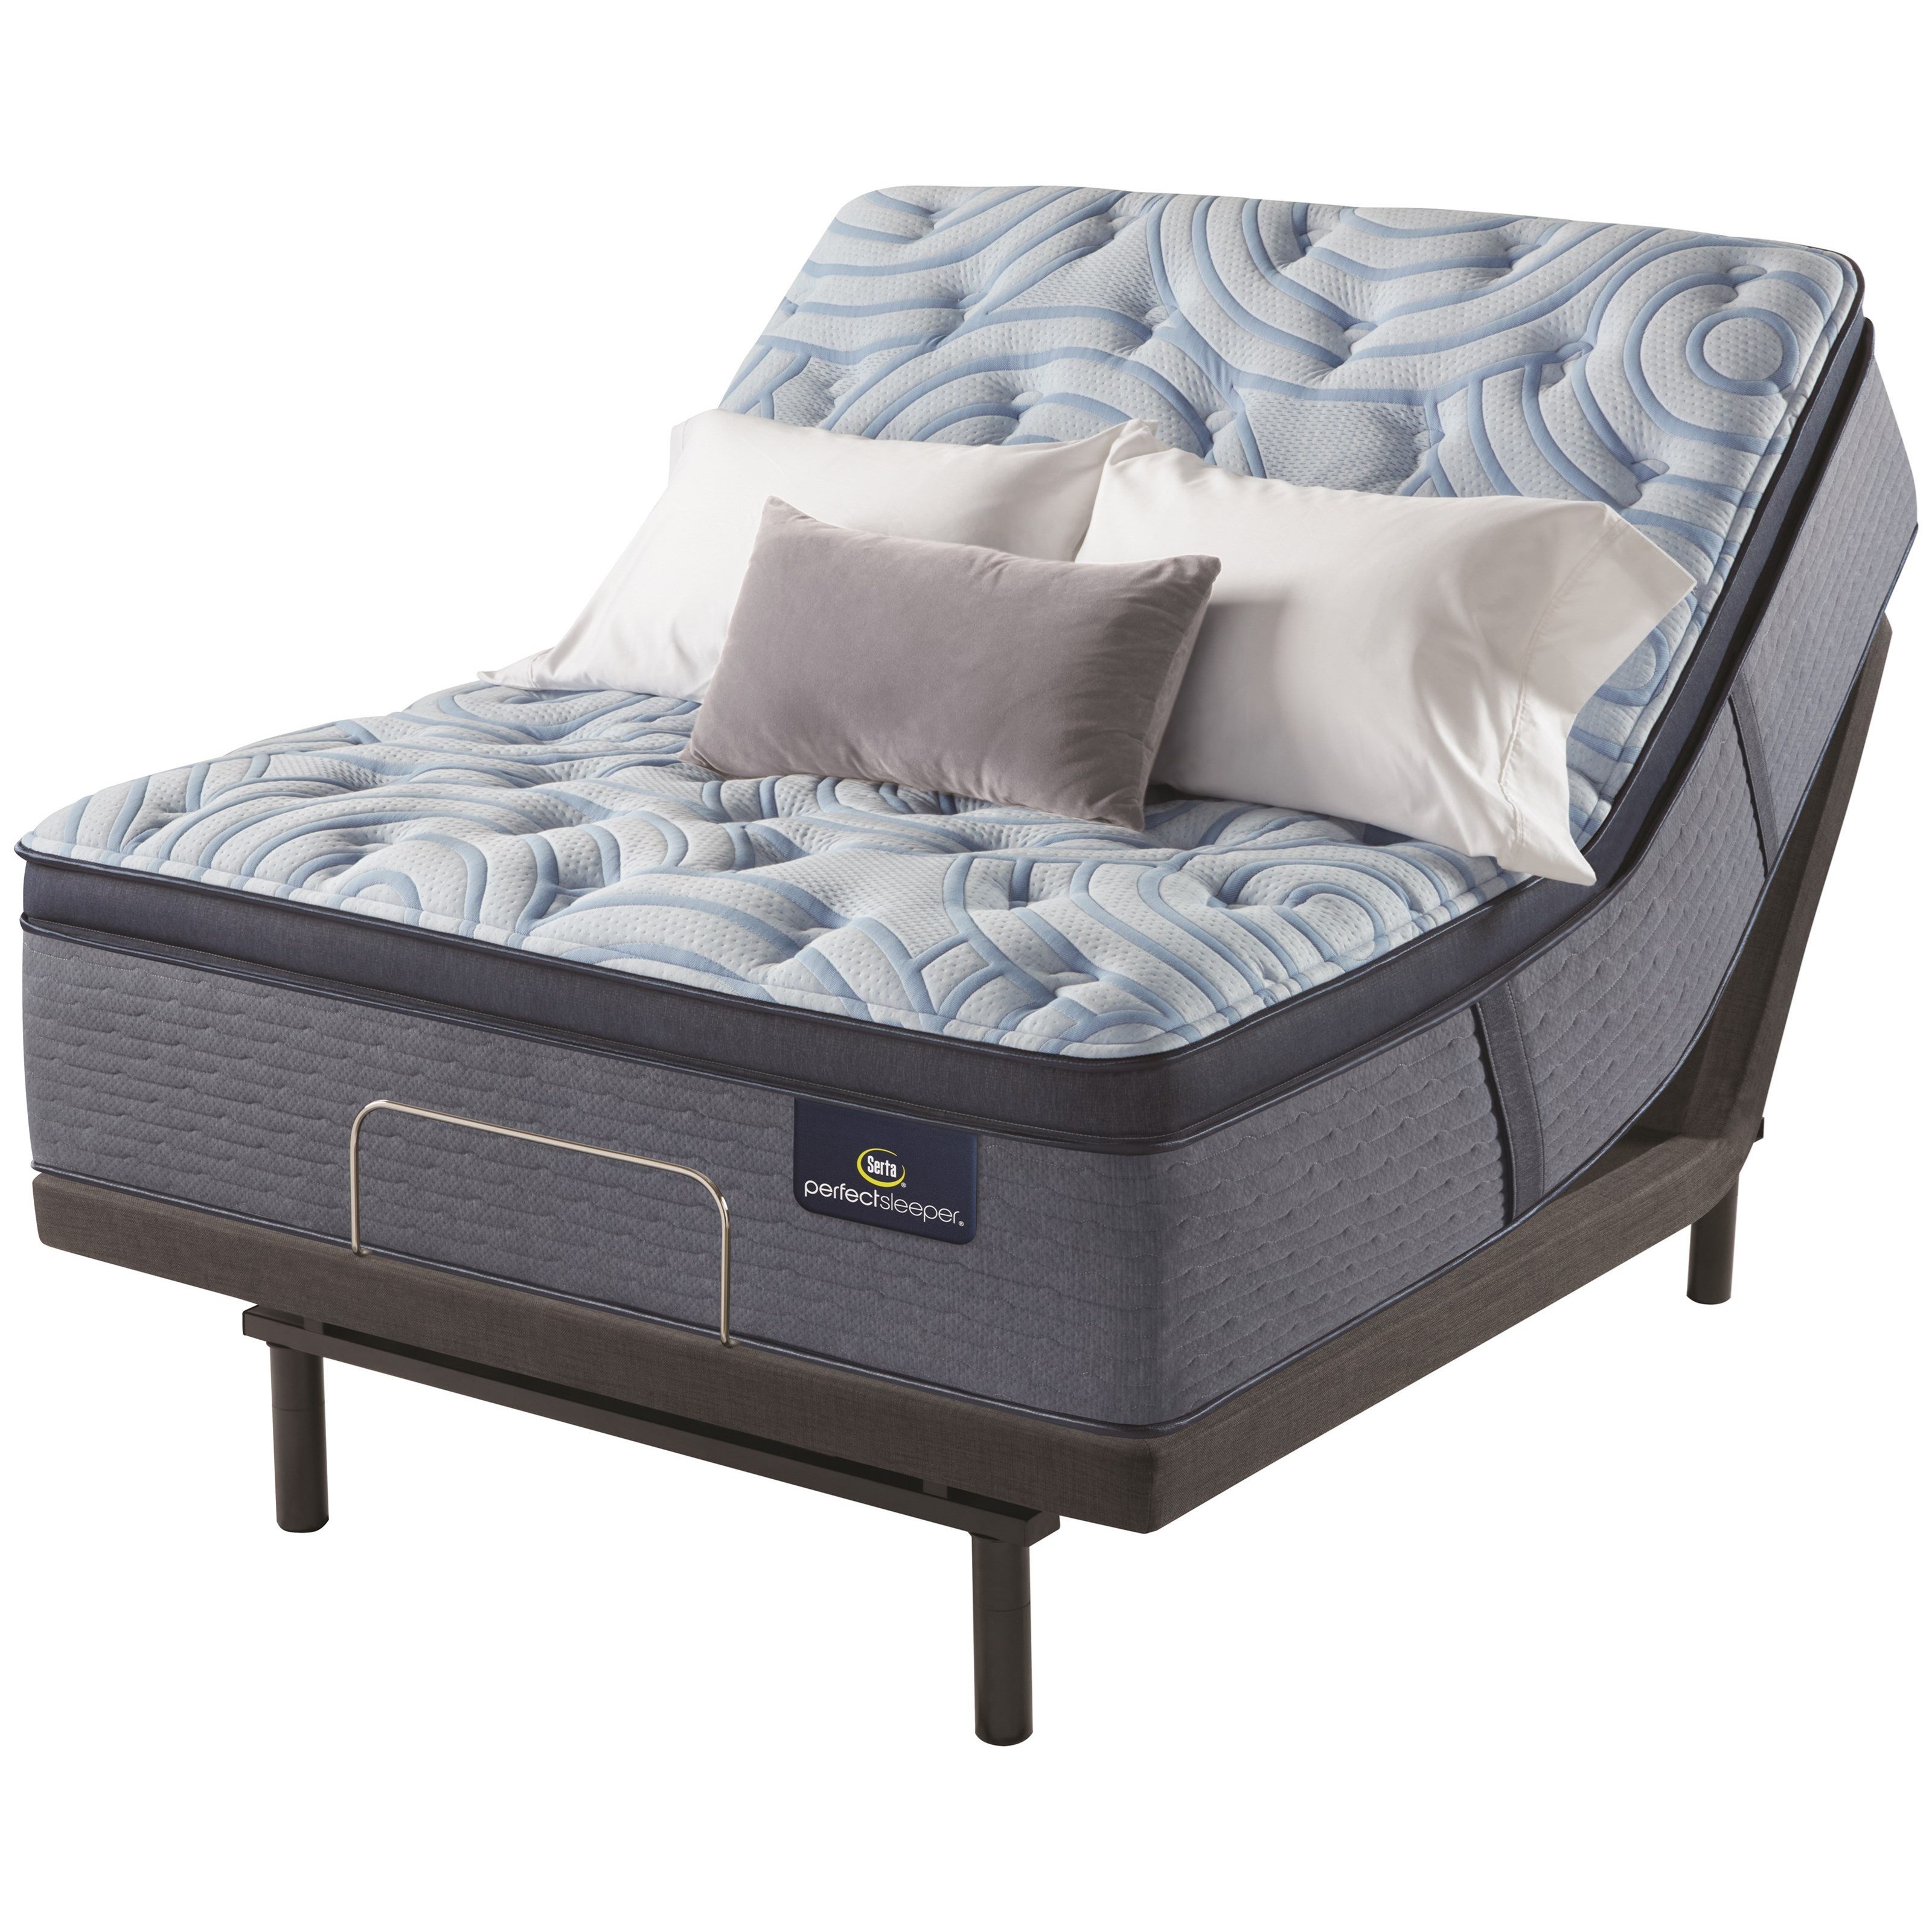 "Luminous Sleep Plush Pillow Top Cal King 17 1/2"" Plush Pillow Top Adj Set by Serta at Goffena Furniture & Mattress Center"